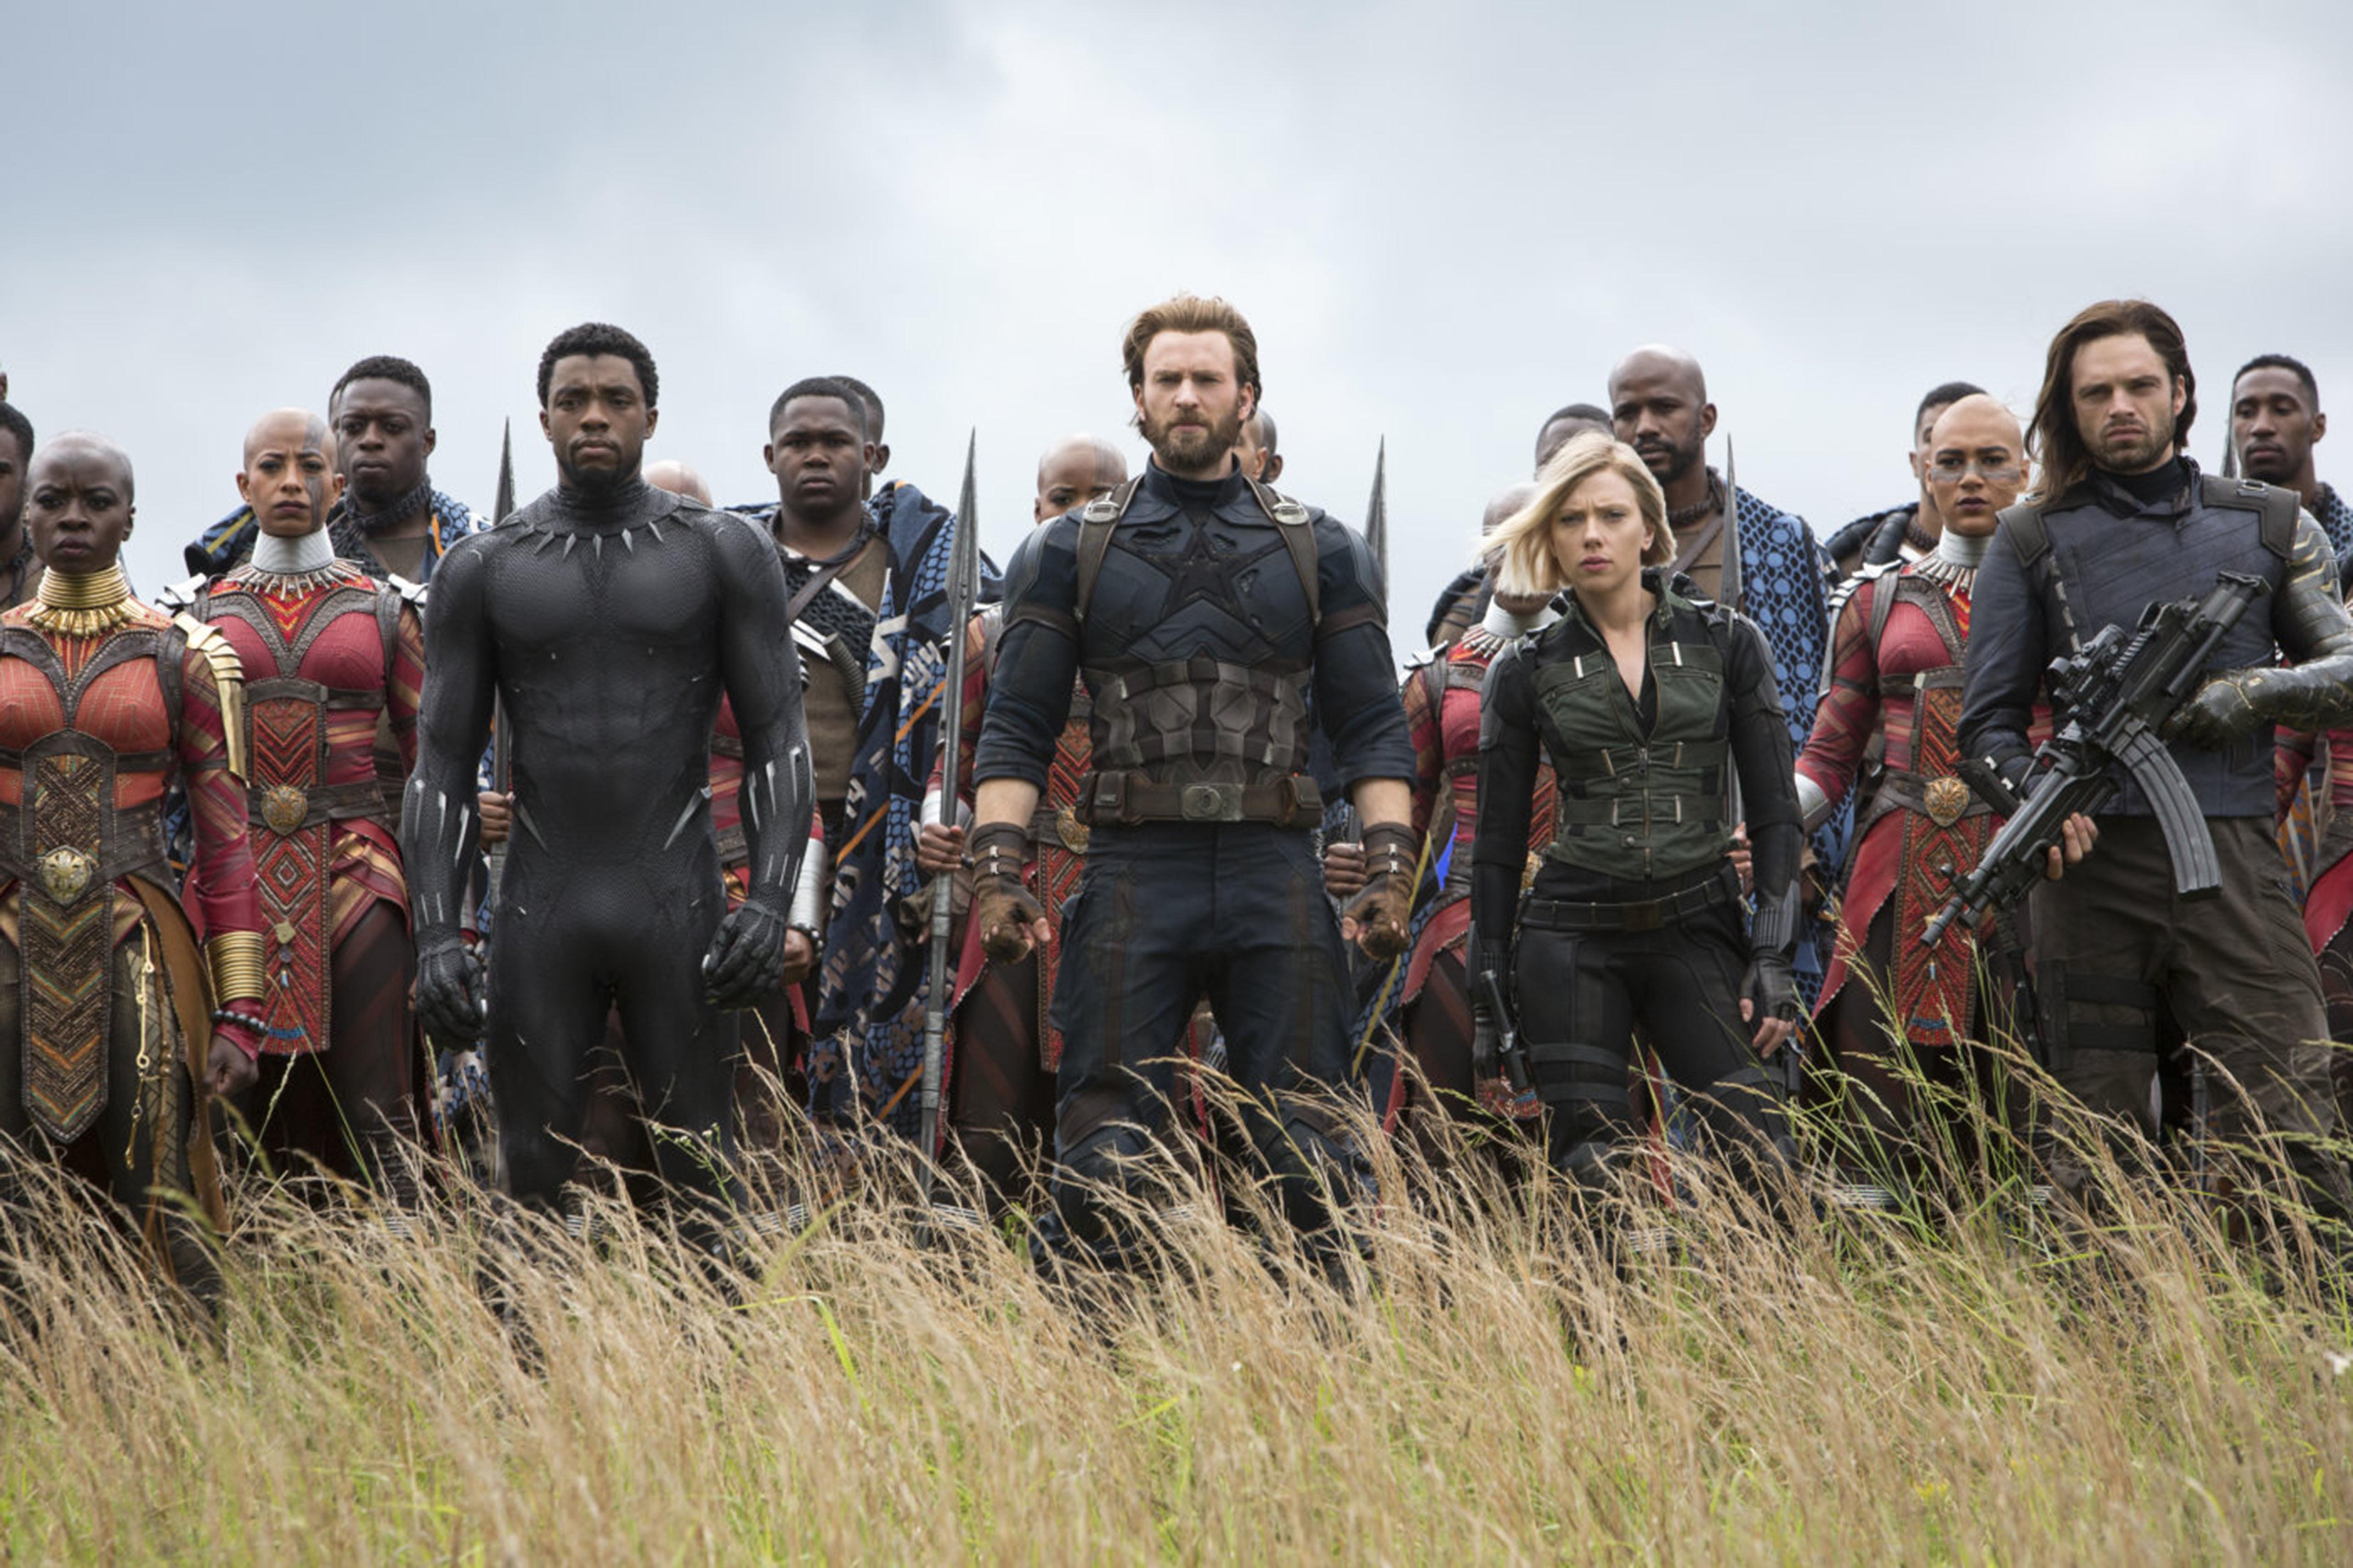 It's Official - 'Avengers: Infinity War' Is The Biggest Superhero Film In UK Cinema History